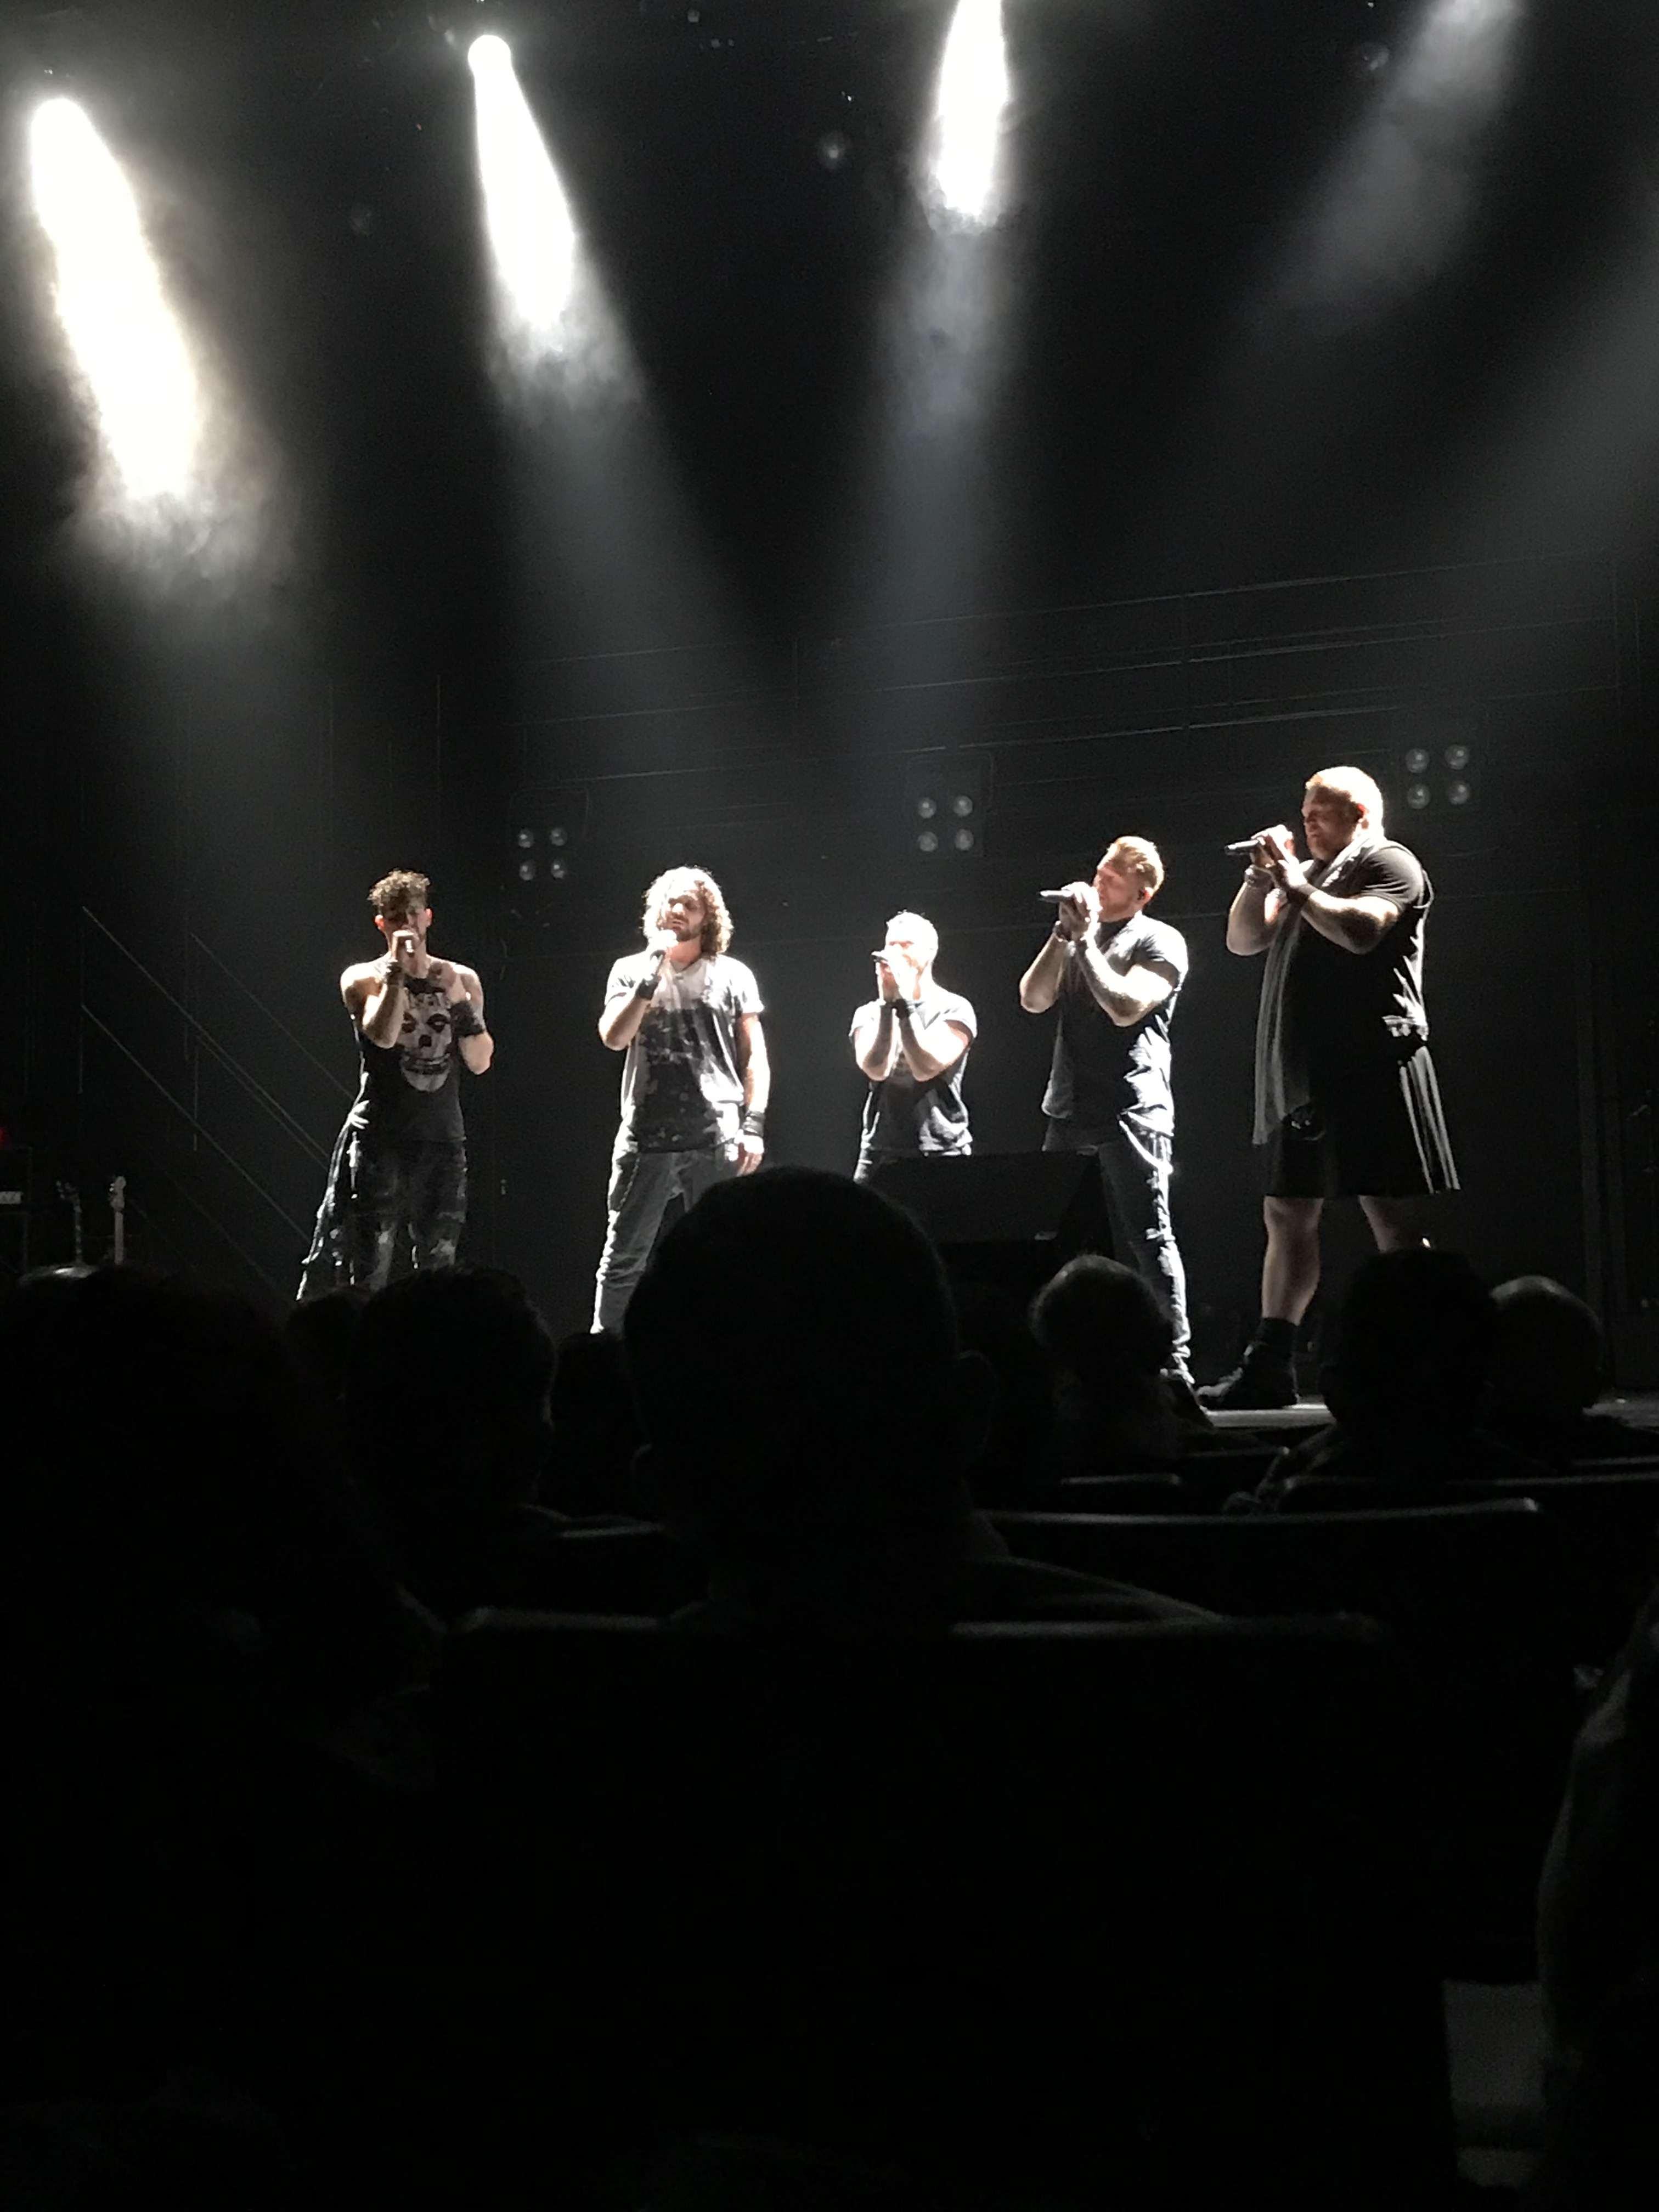 The Tenors of Rock | British Rock Band at Harrah's Las Vegas | Elle Blonde Luxury Lifestyle Destination Blog